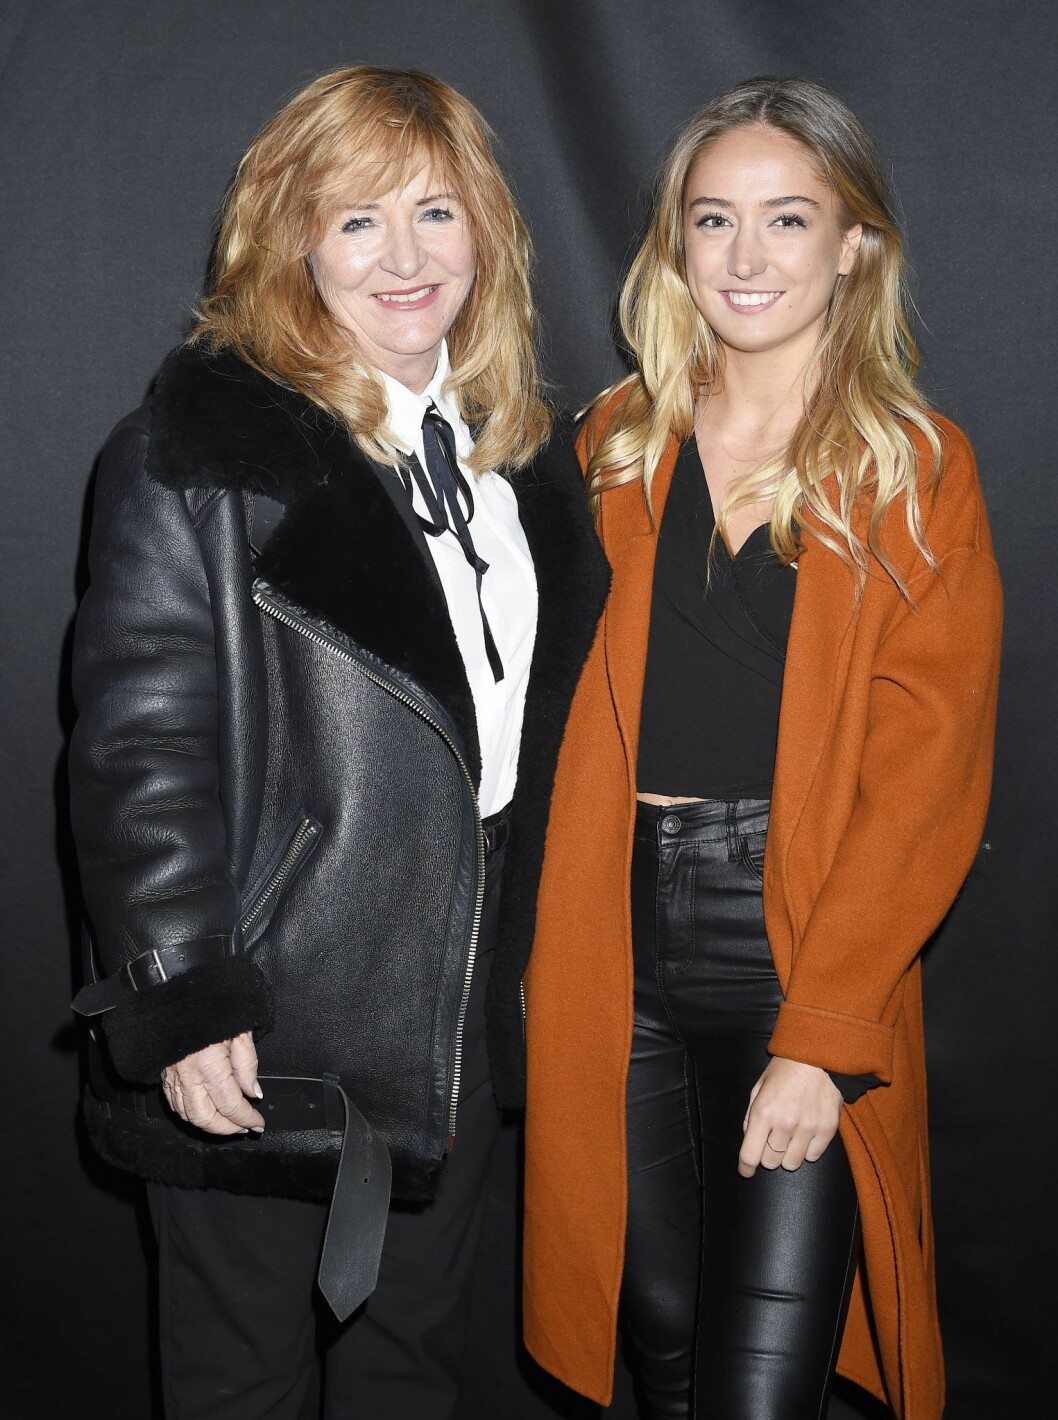 Malou von Sivers med dottern Julia.